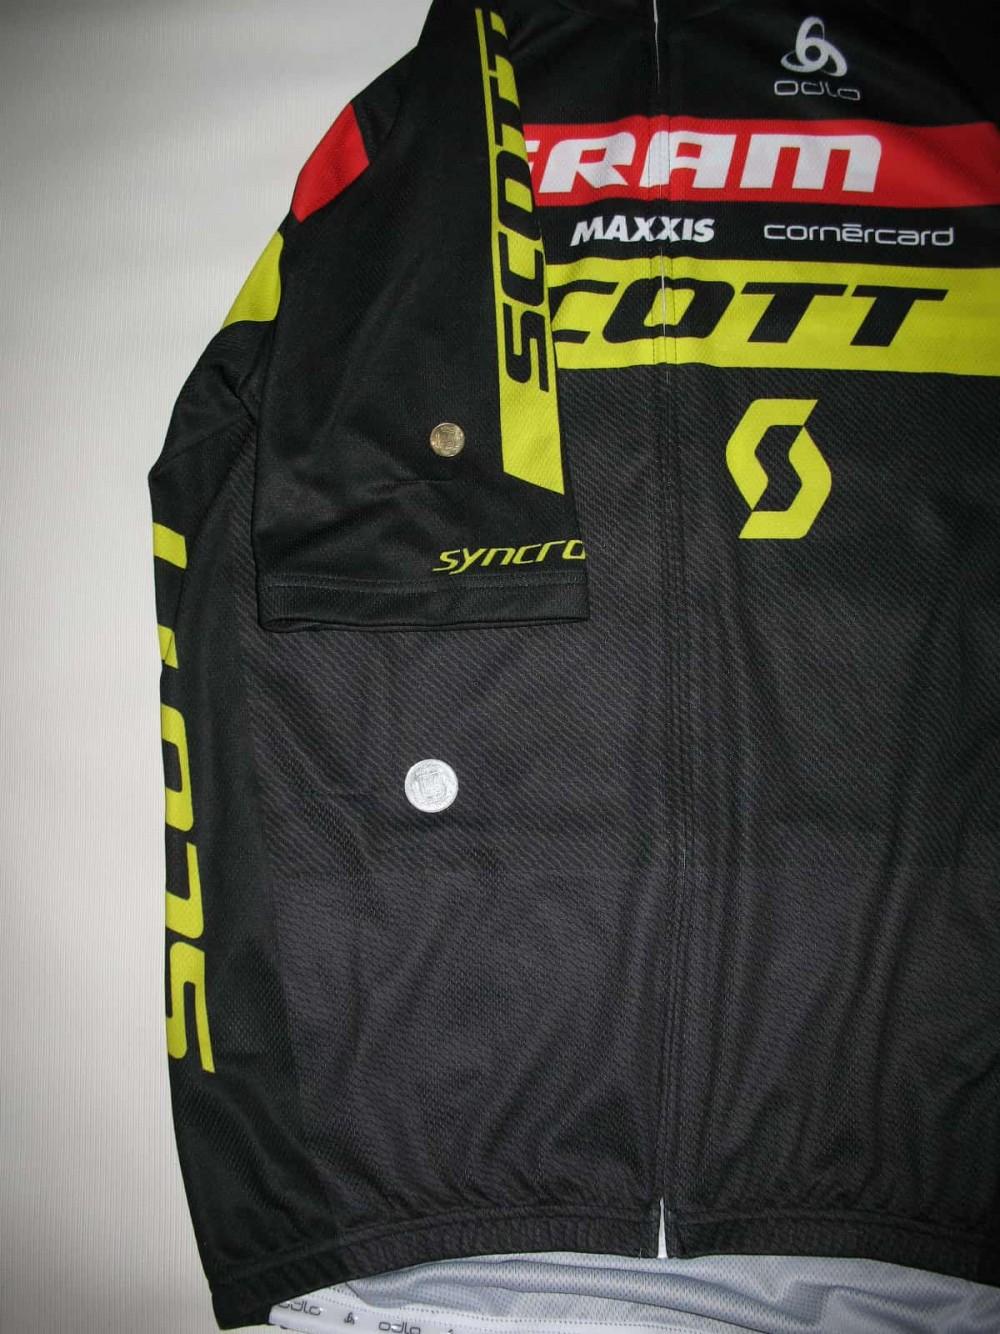 Веломайка ODLO scott sram cycling jersey (размер L) - 12